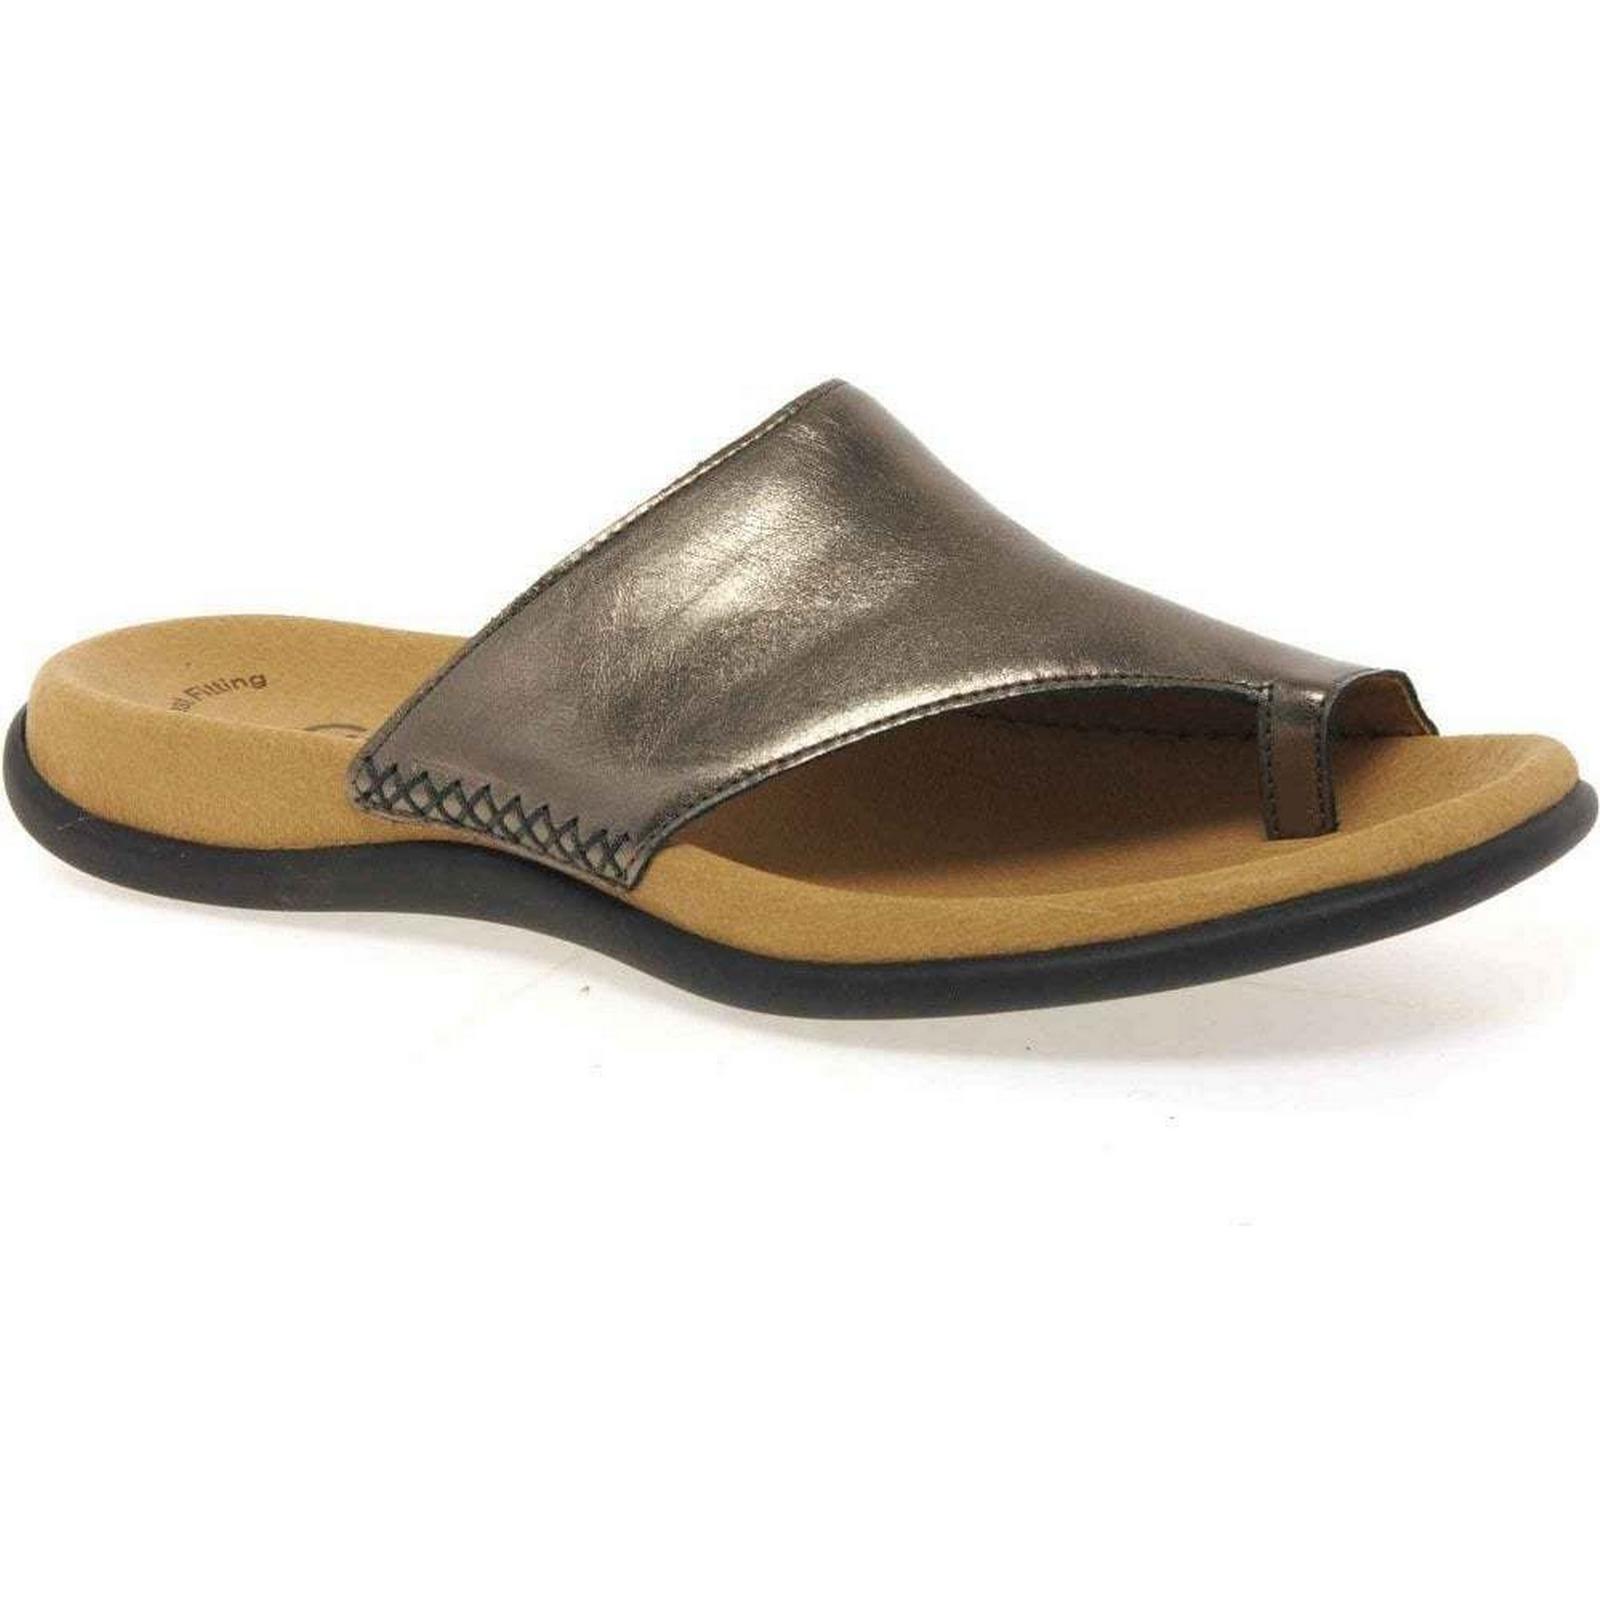 Gabor Lanzarote Toe Antique Loop Womens Mules Colour: Antique Toe Silver, Size: 6 442f13